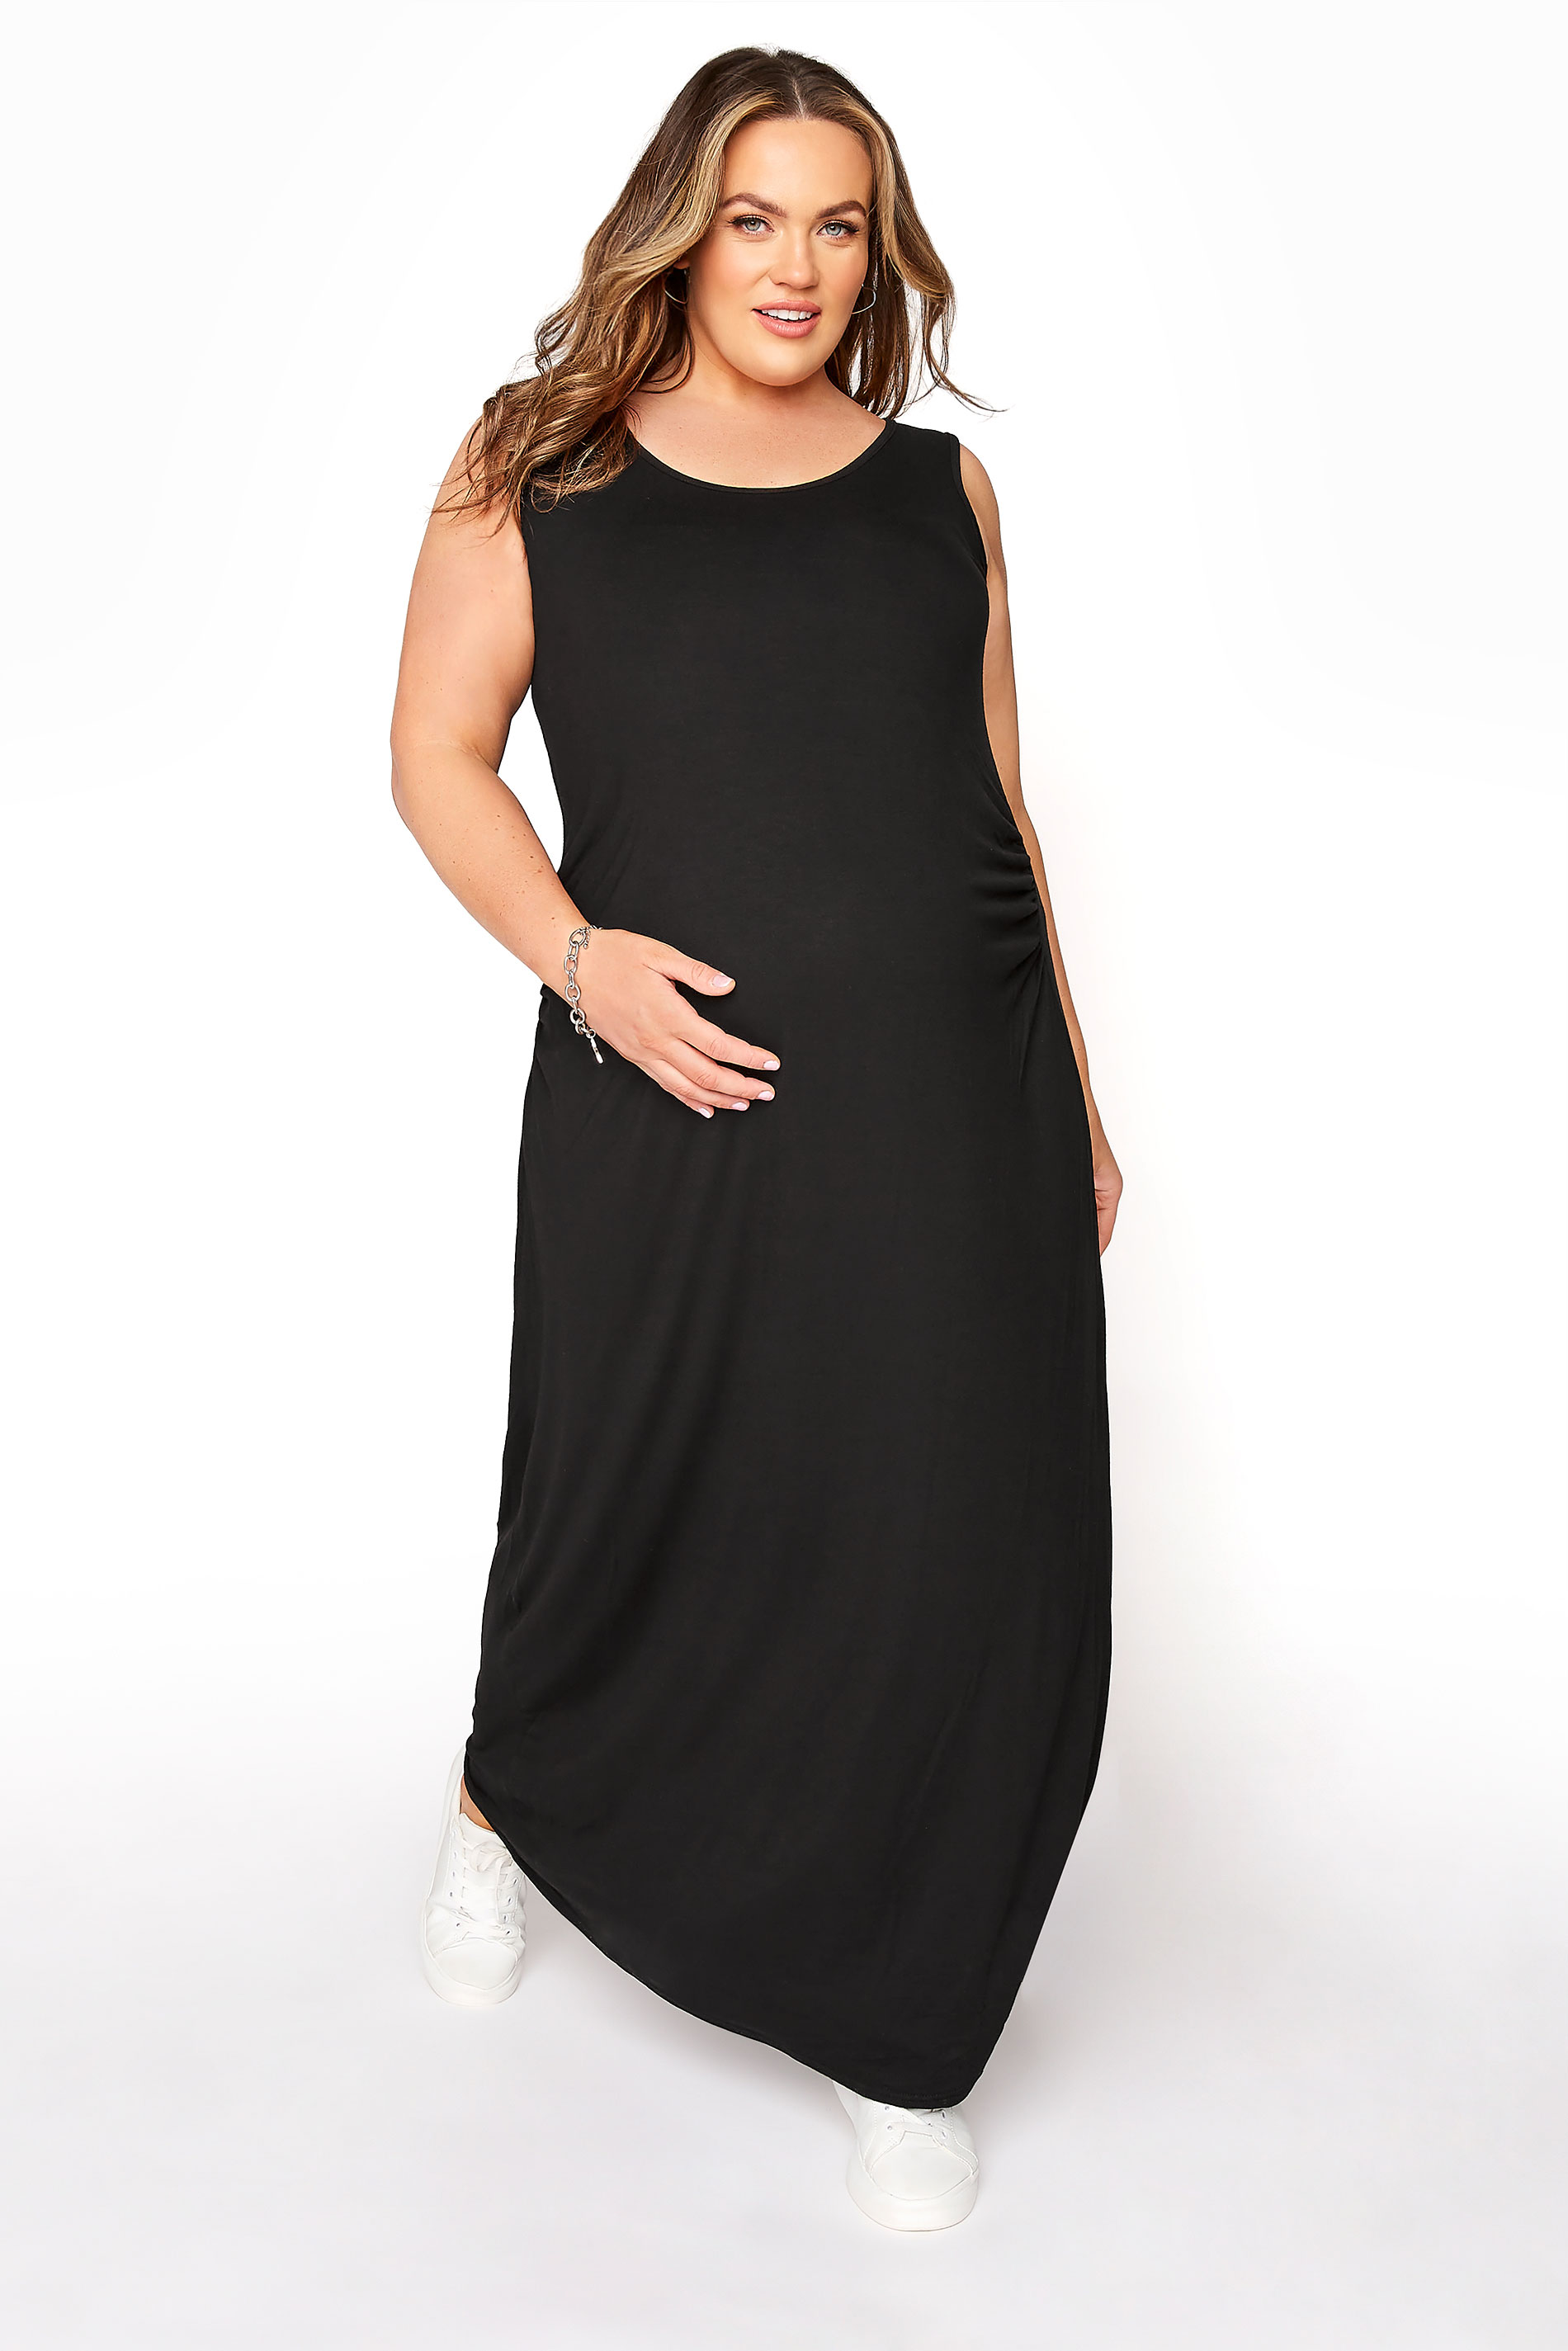 BUMP IT UP MATERNITY Black Sleeveless Maxi Dress_A.jpg